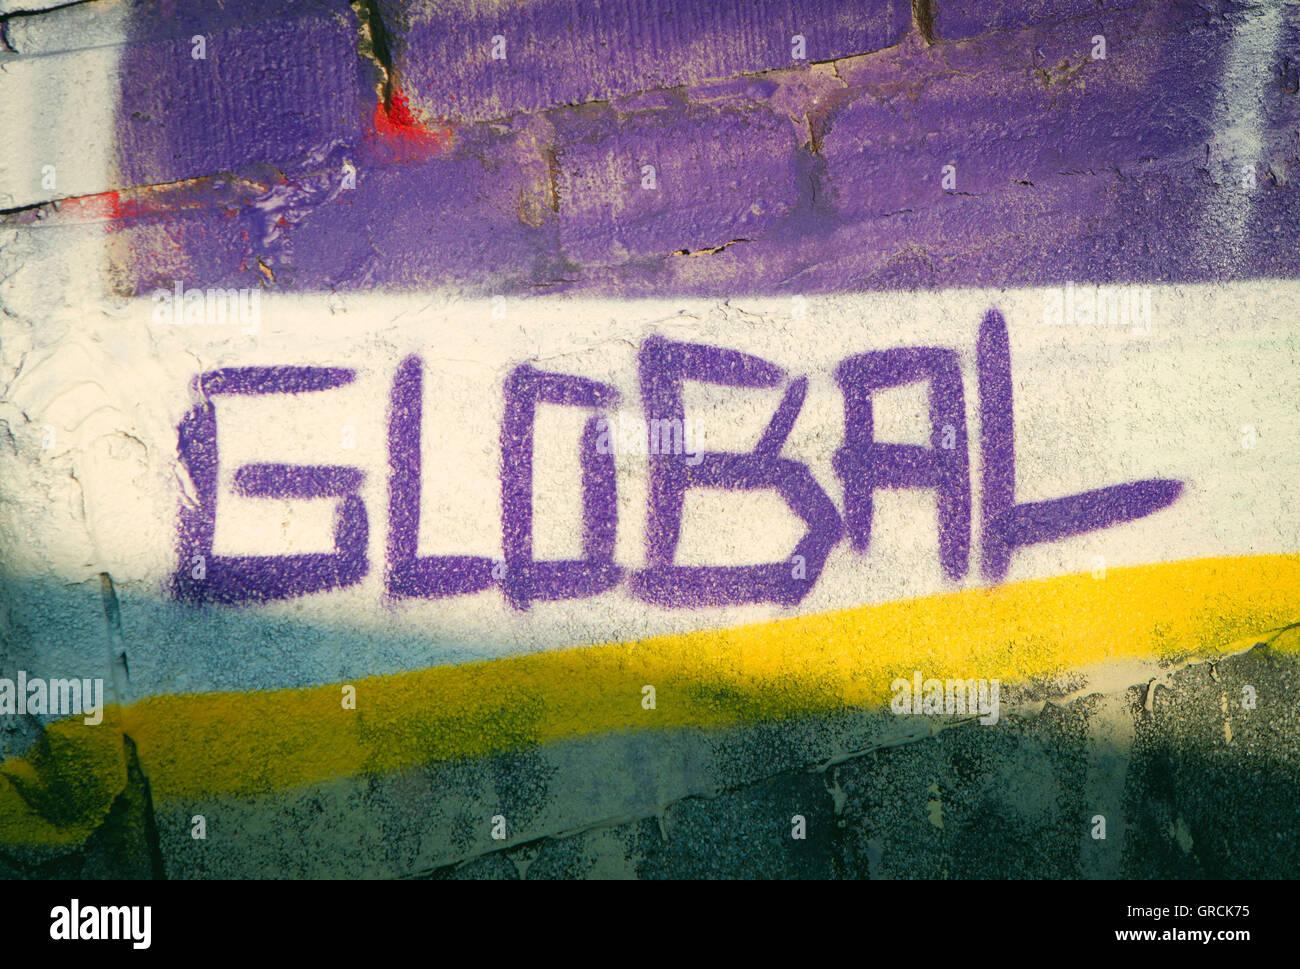 Global, Graffiti, Cultura Juvenil Imagen De Stock